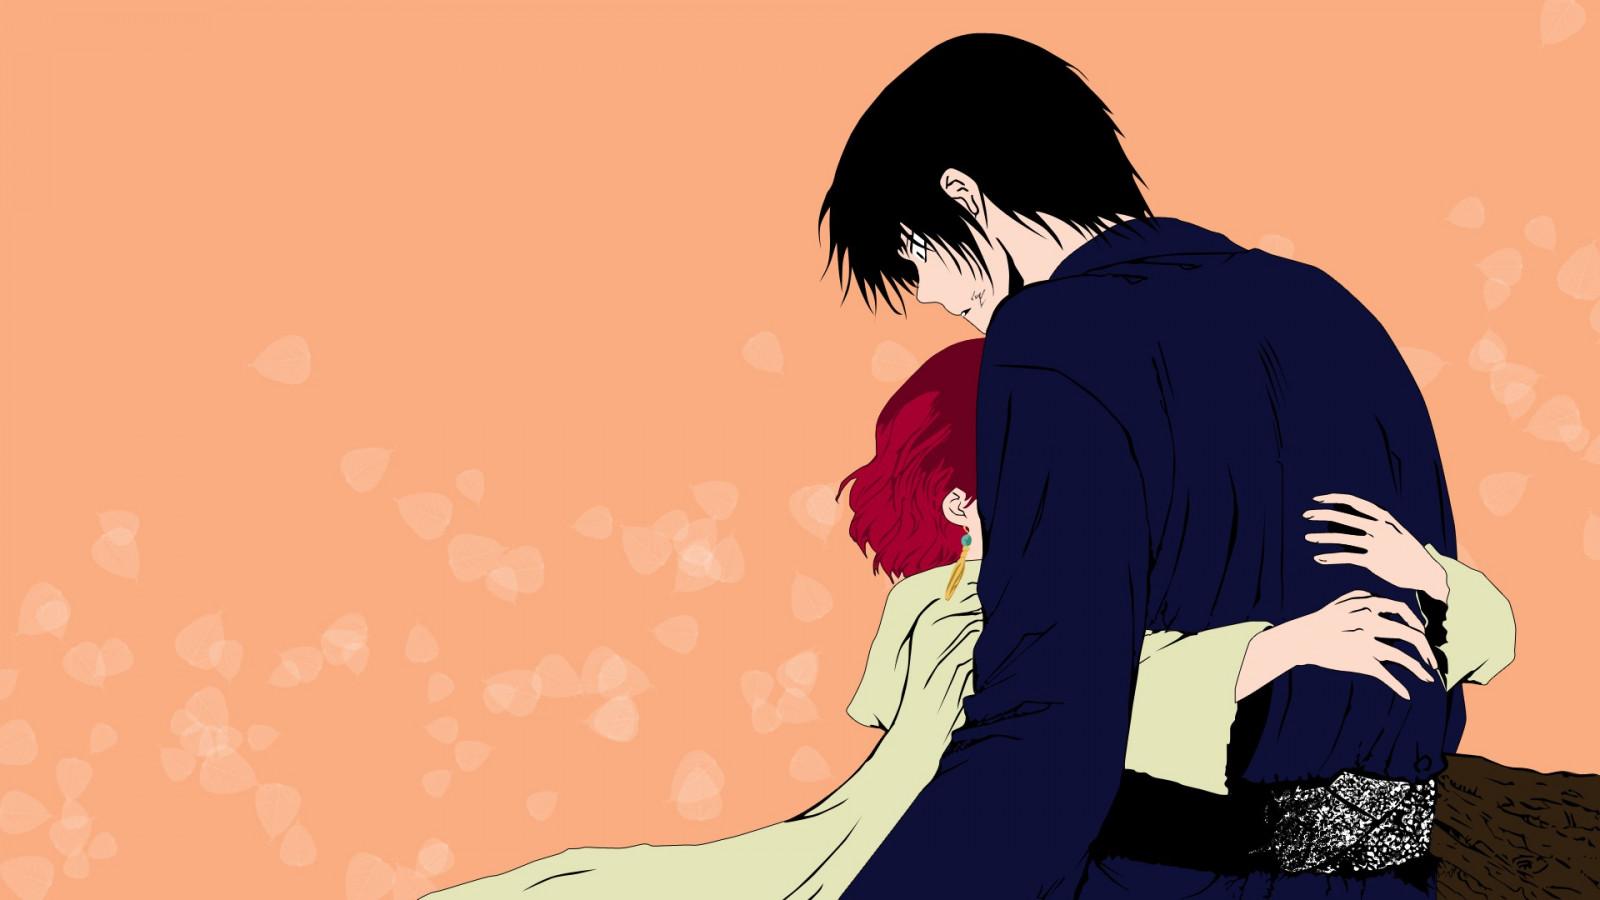 700 Koleksi Wallpaper Kartun Anime Romantis Gratis Terbaik